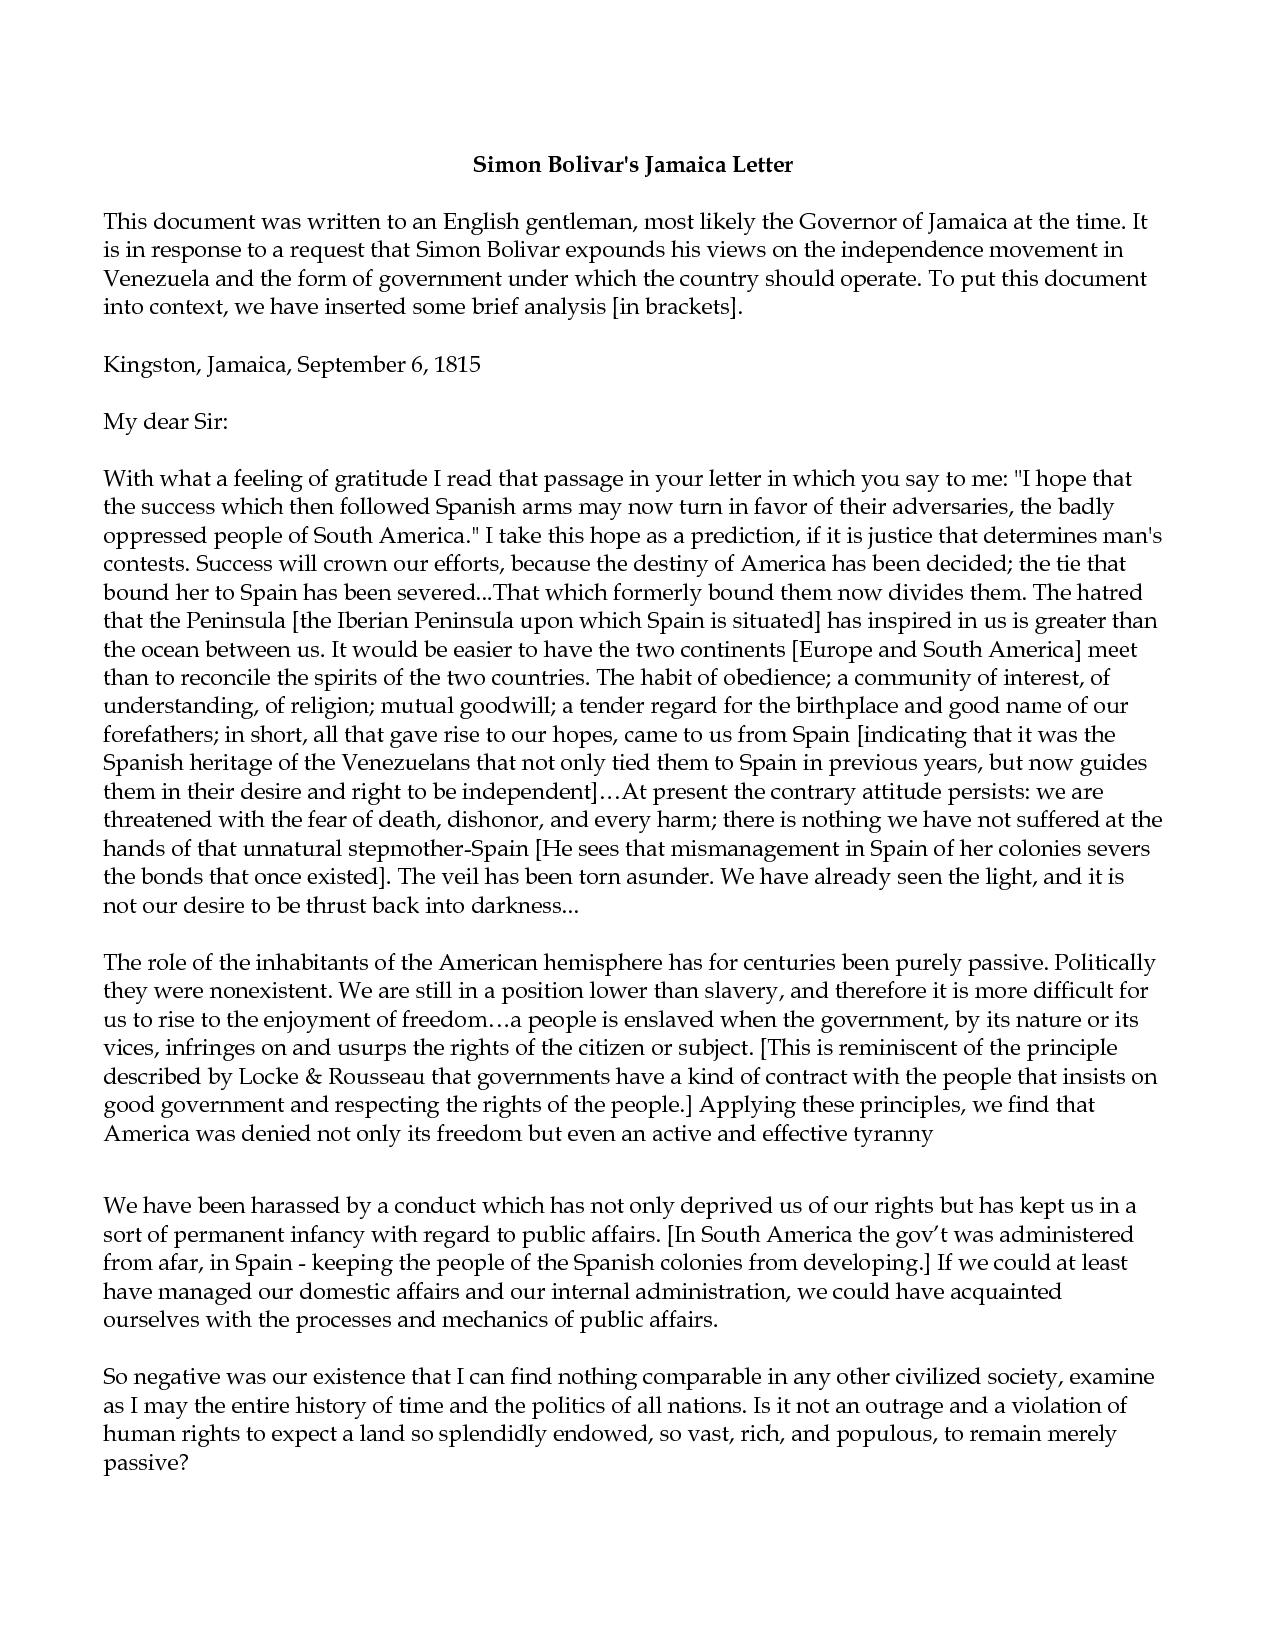 Simon Bolivar S The Jamaican Letter